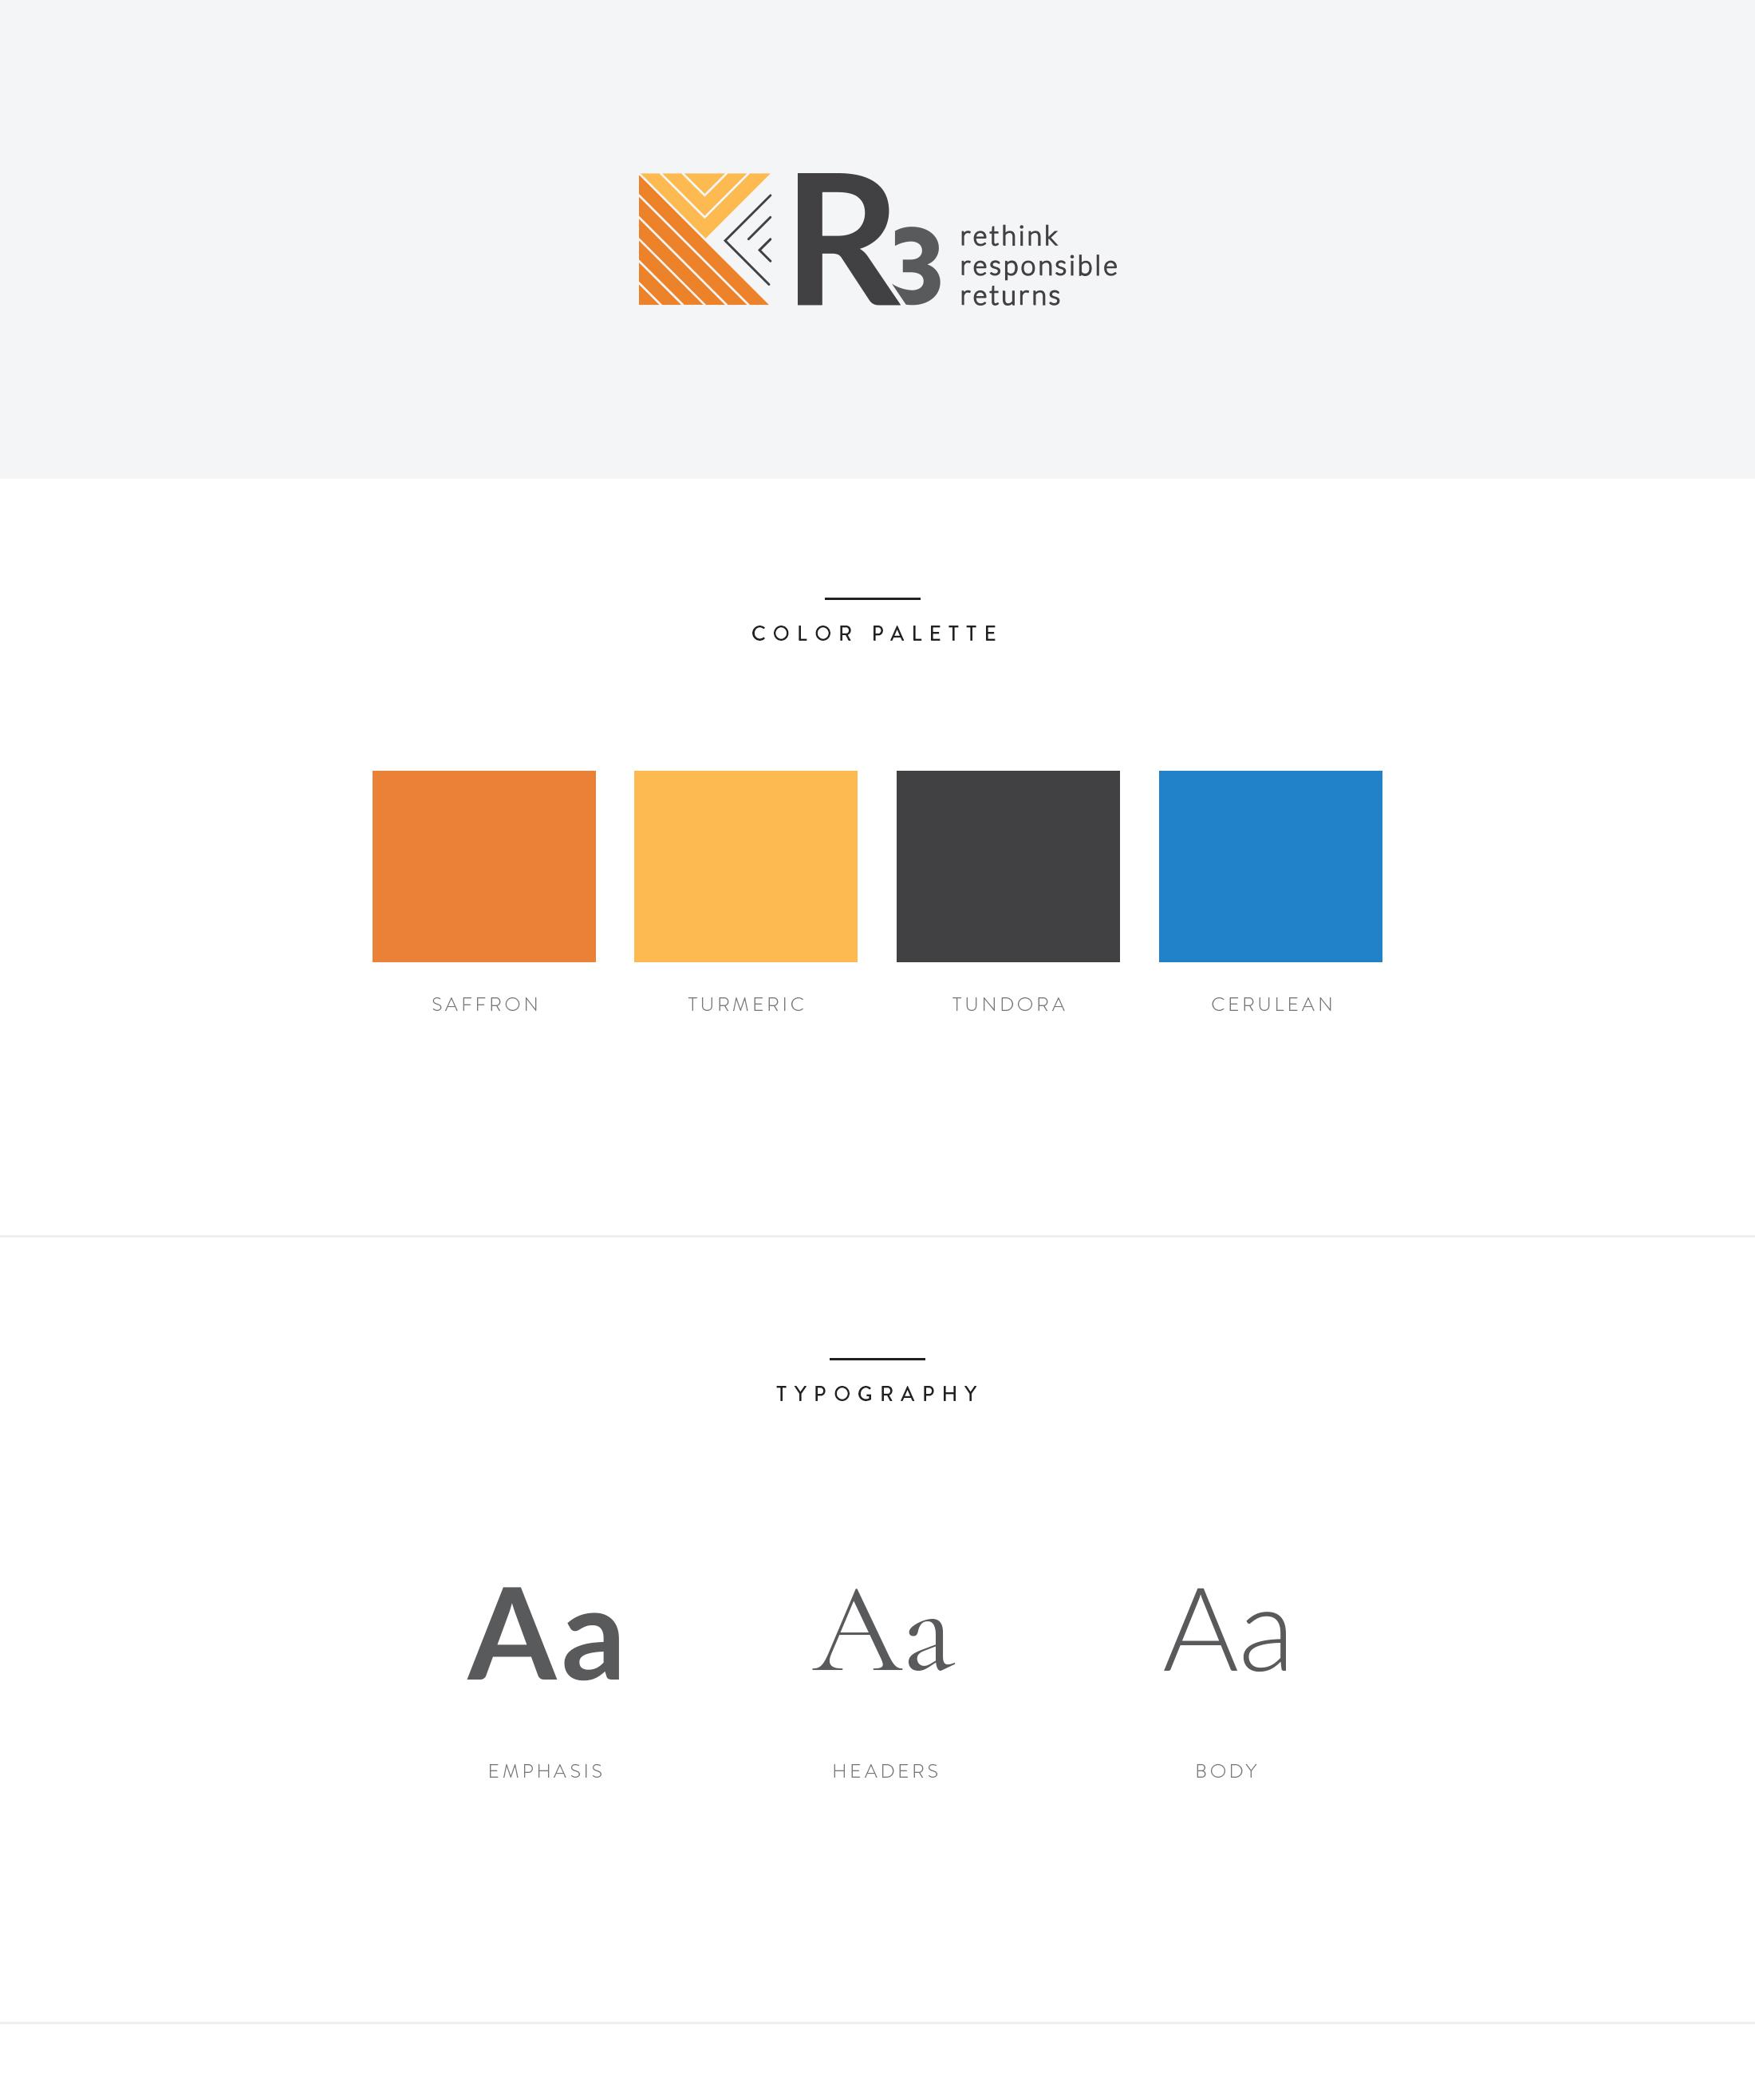 r3-returns-design.jpg